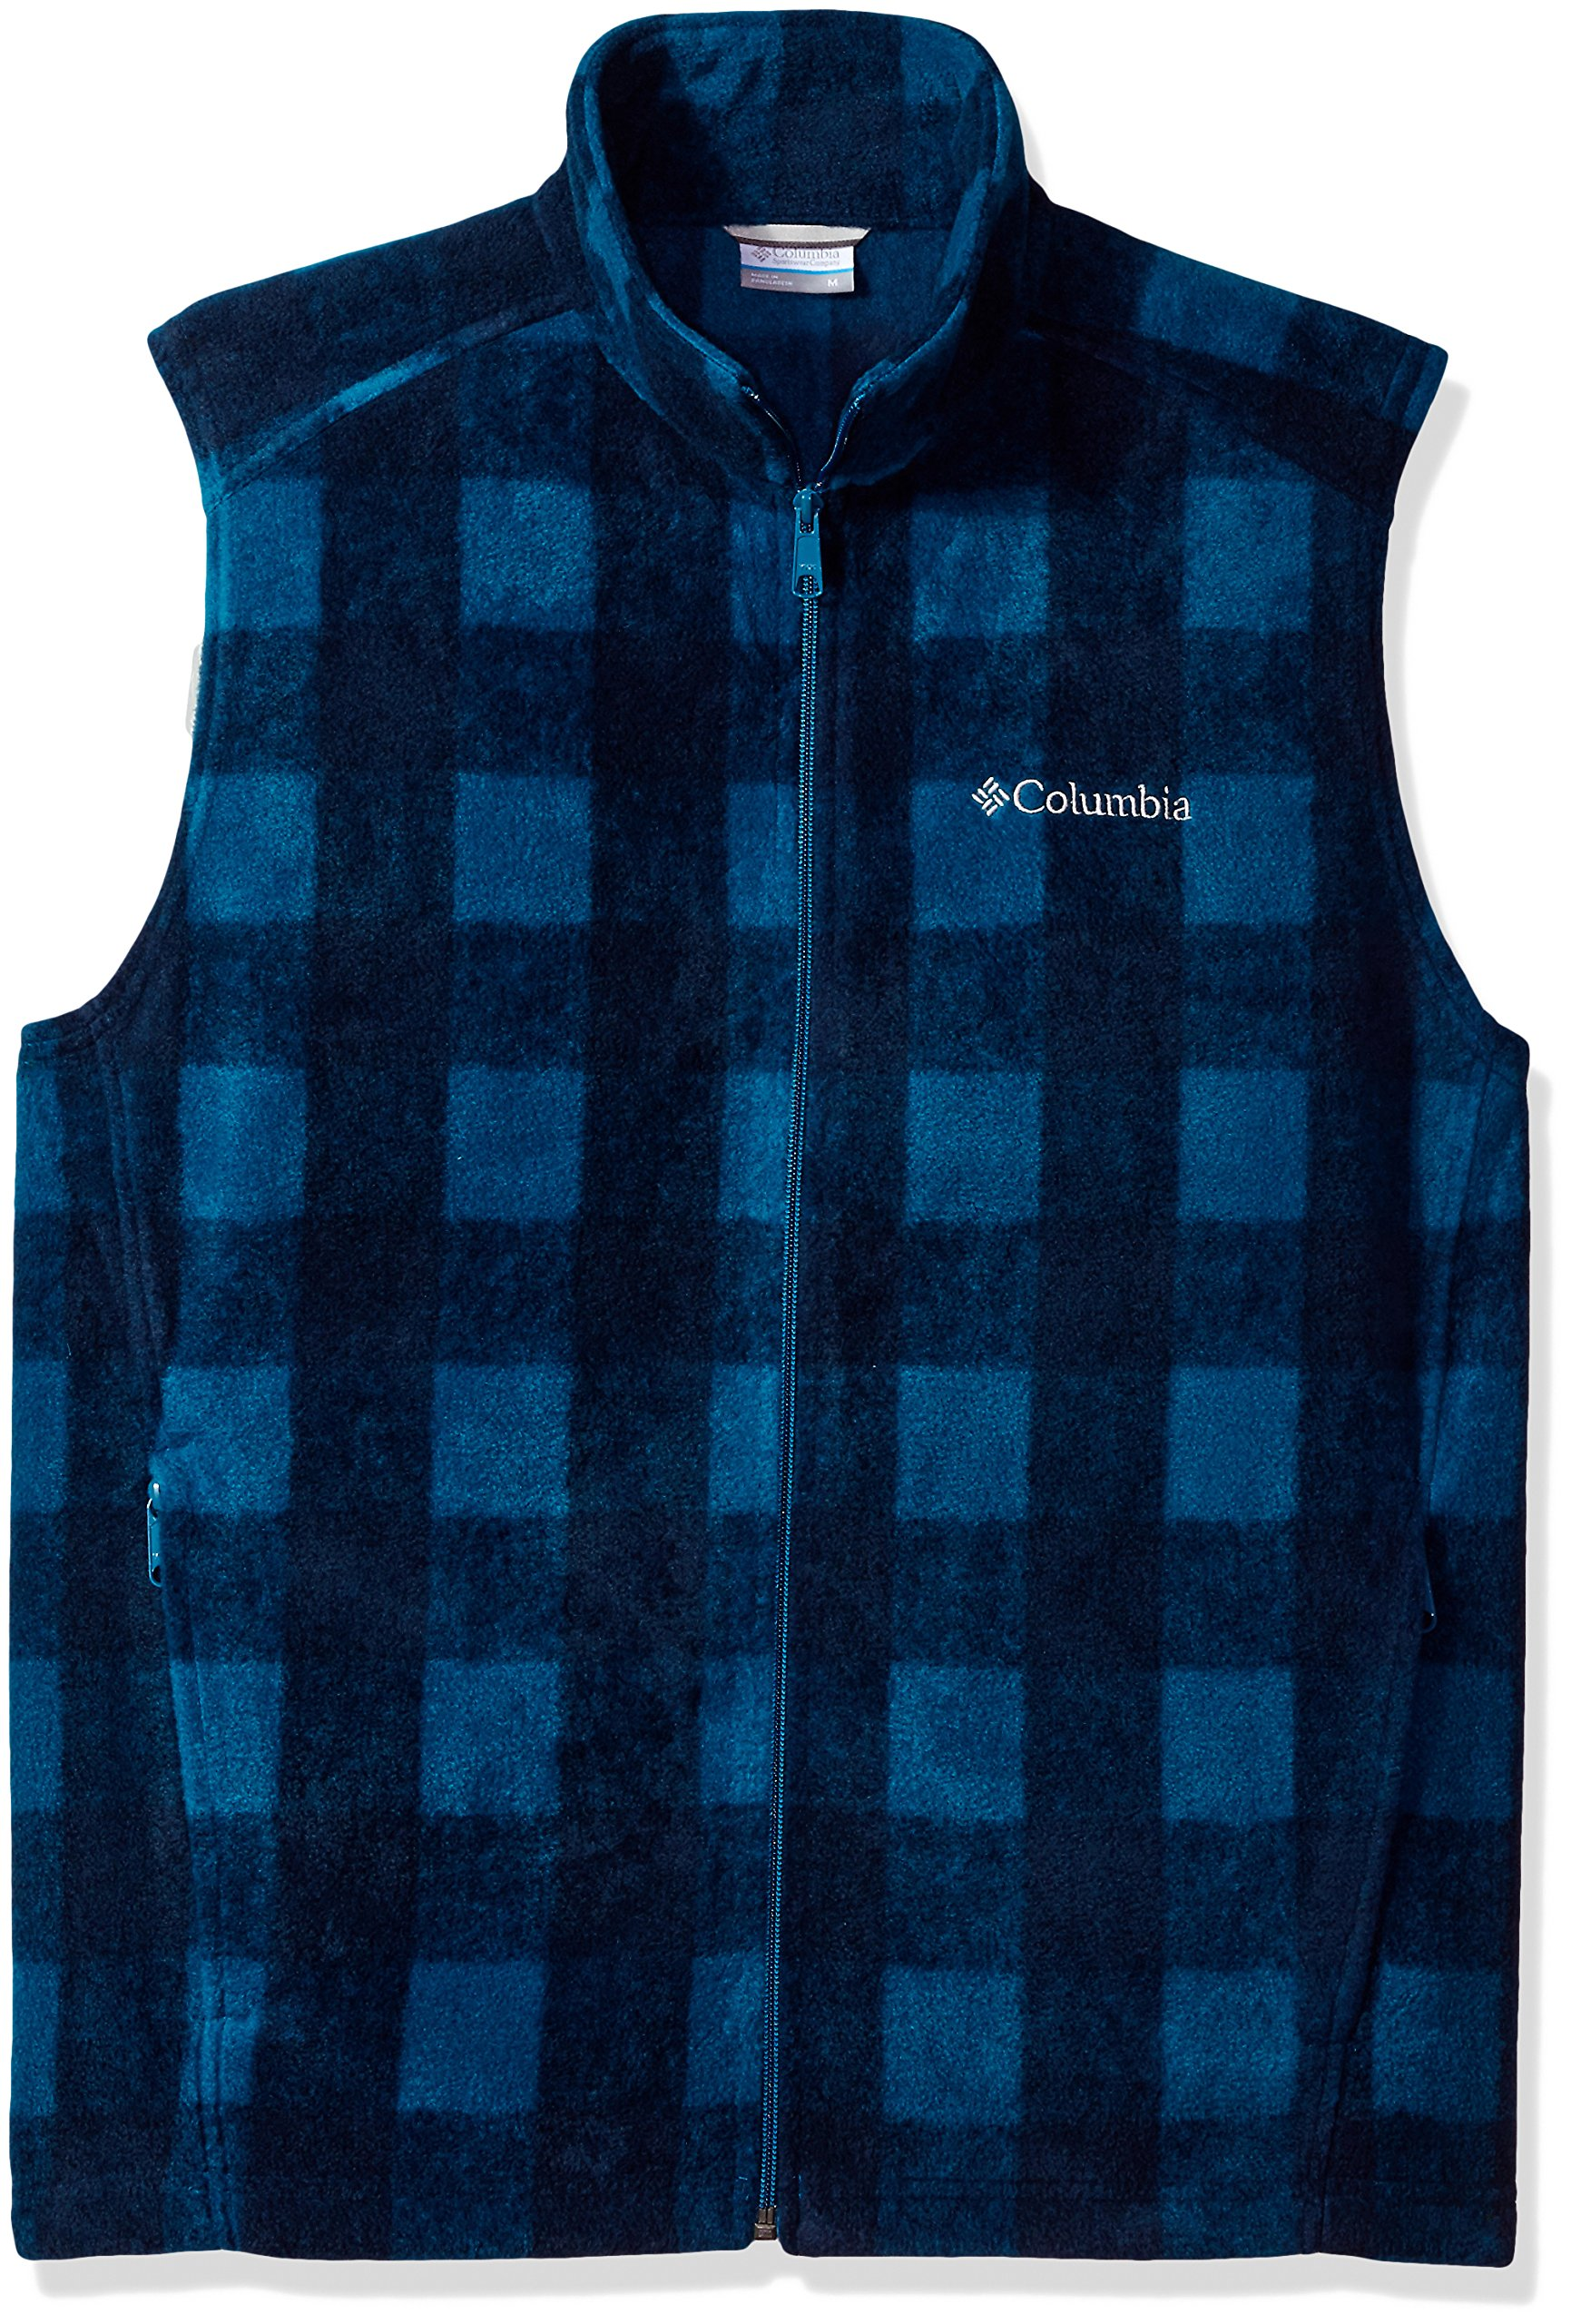 Columbia Men's Cascades Explorer Full Zip Fleece Jacket, Phoenix Blue Plaid, Large